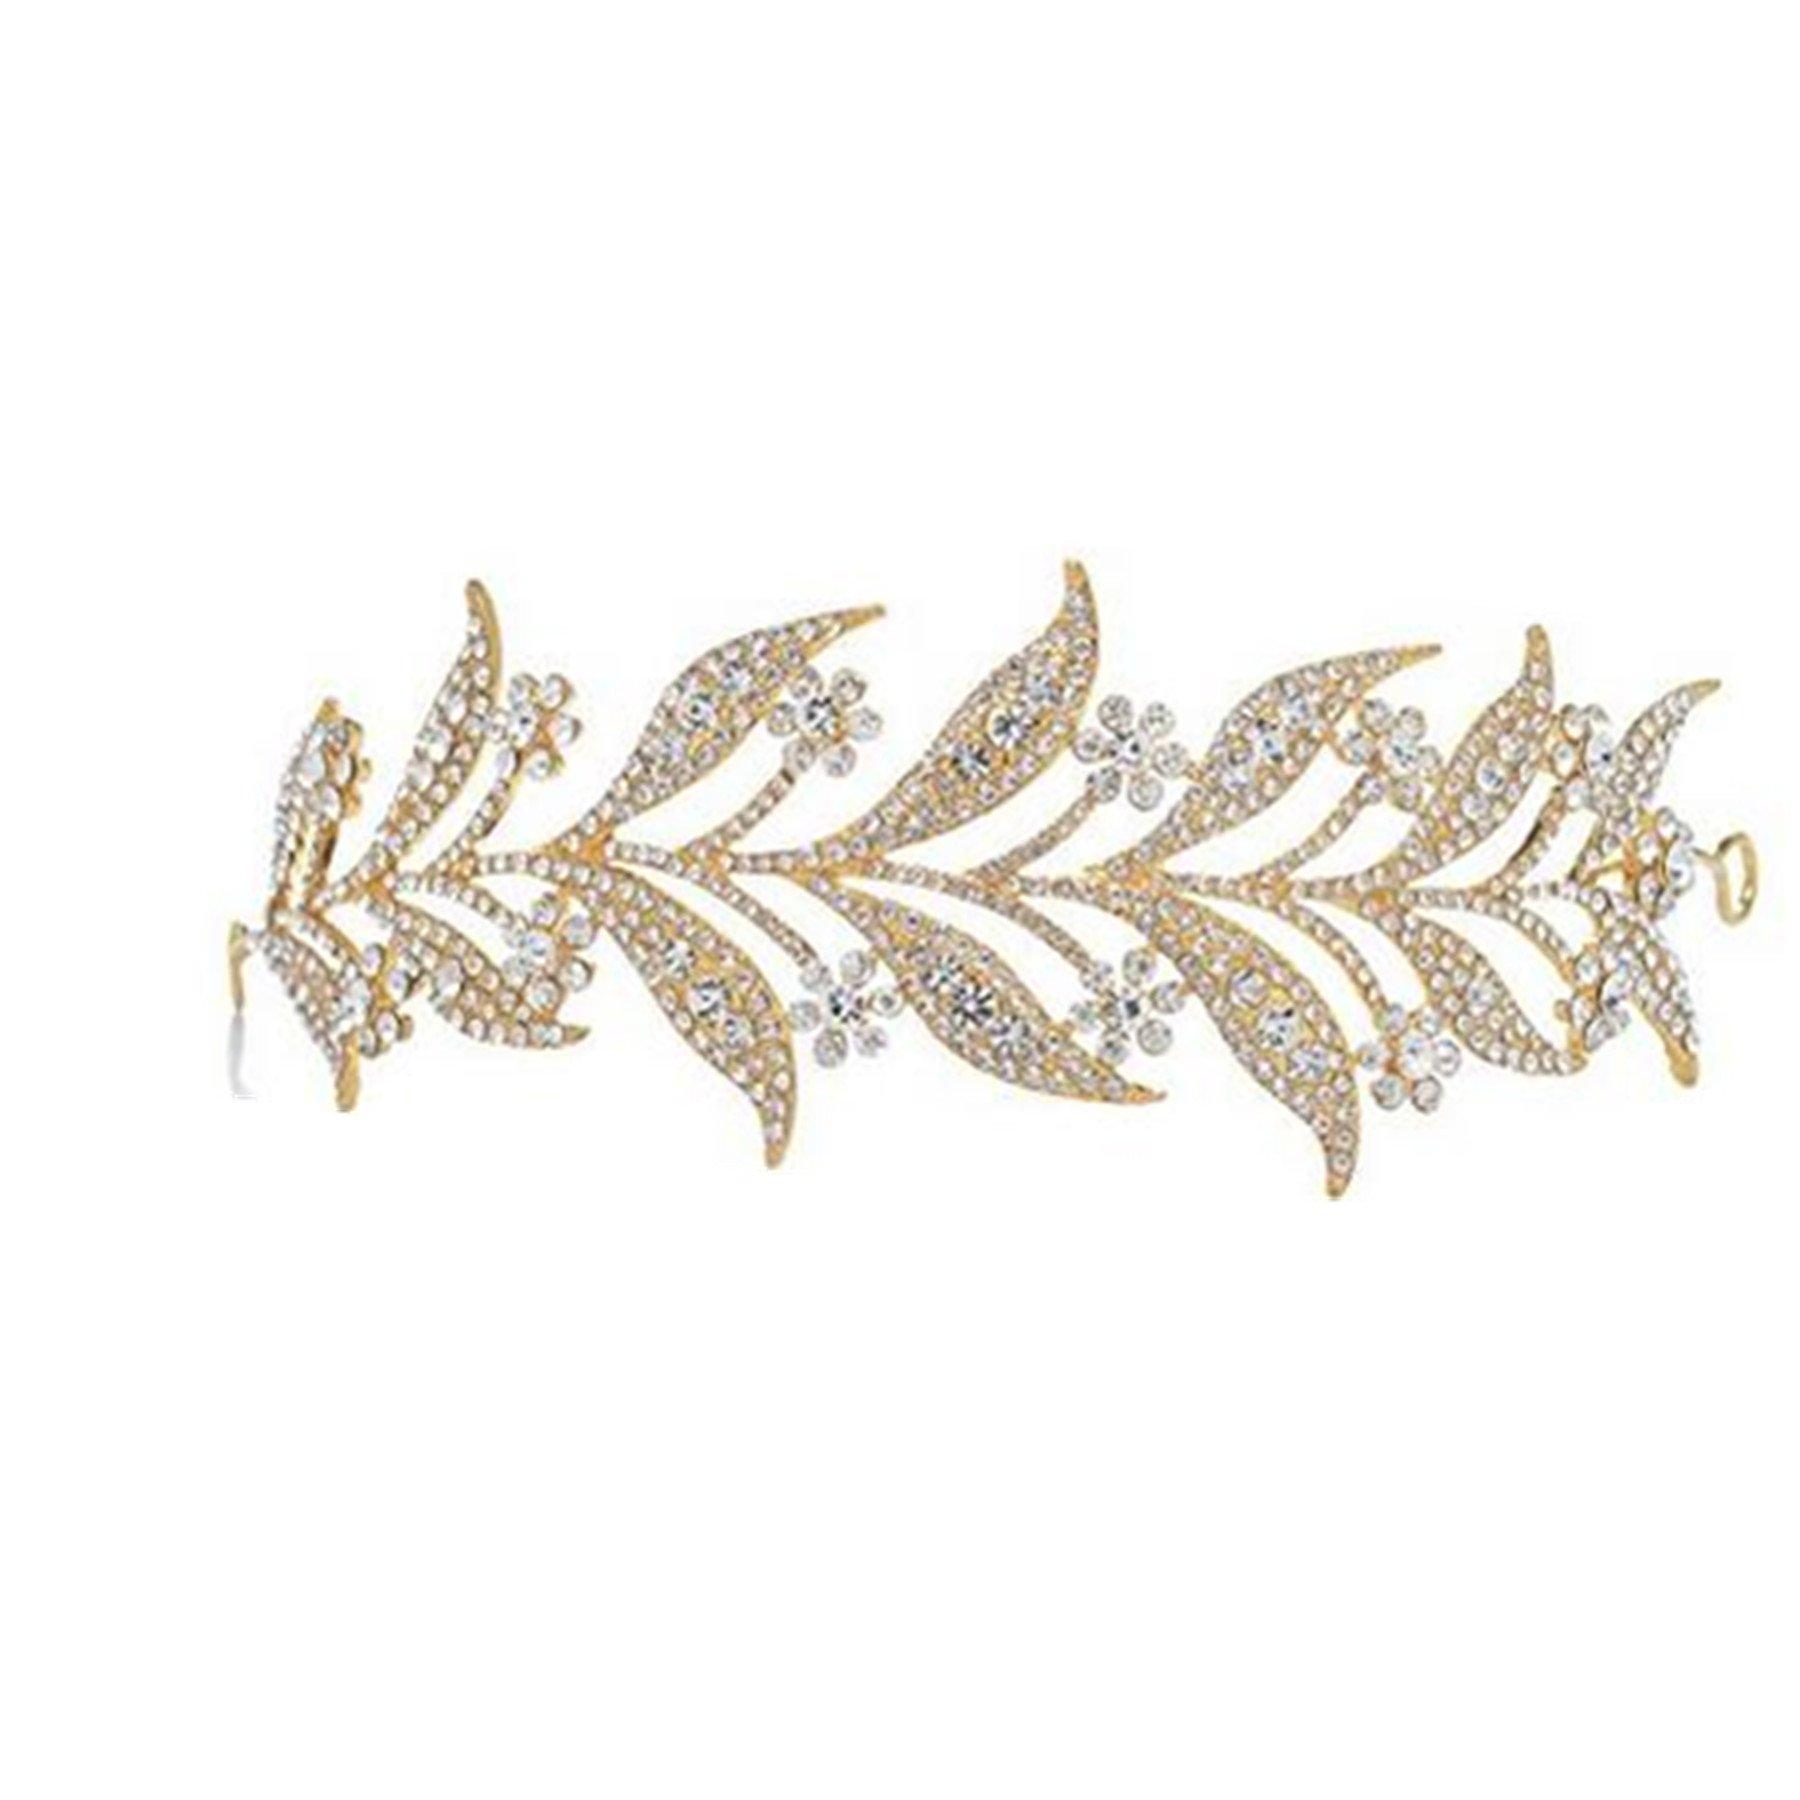 Wiipu Leaves Rhinestone Crystal Wedding Headband Bridal Tiara Crown(N433) (Golden-tone)